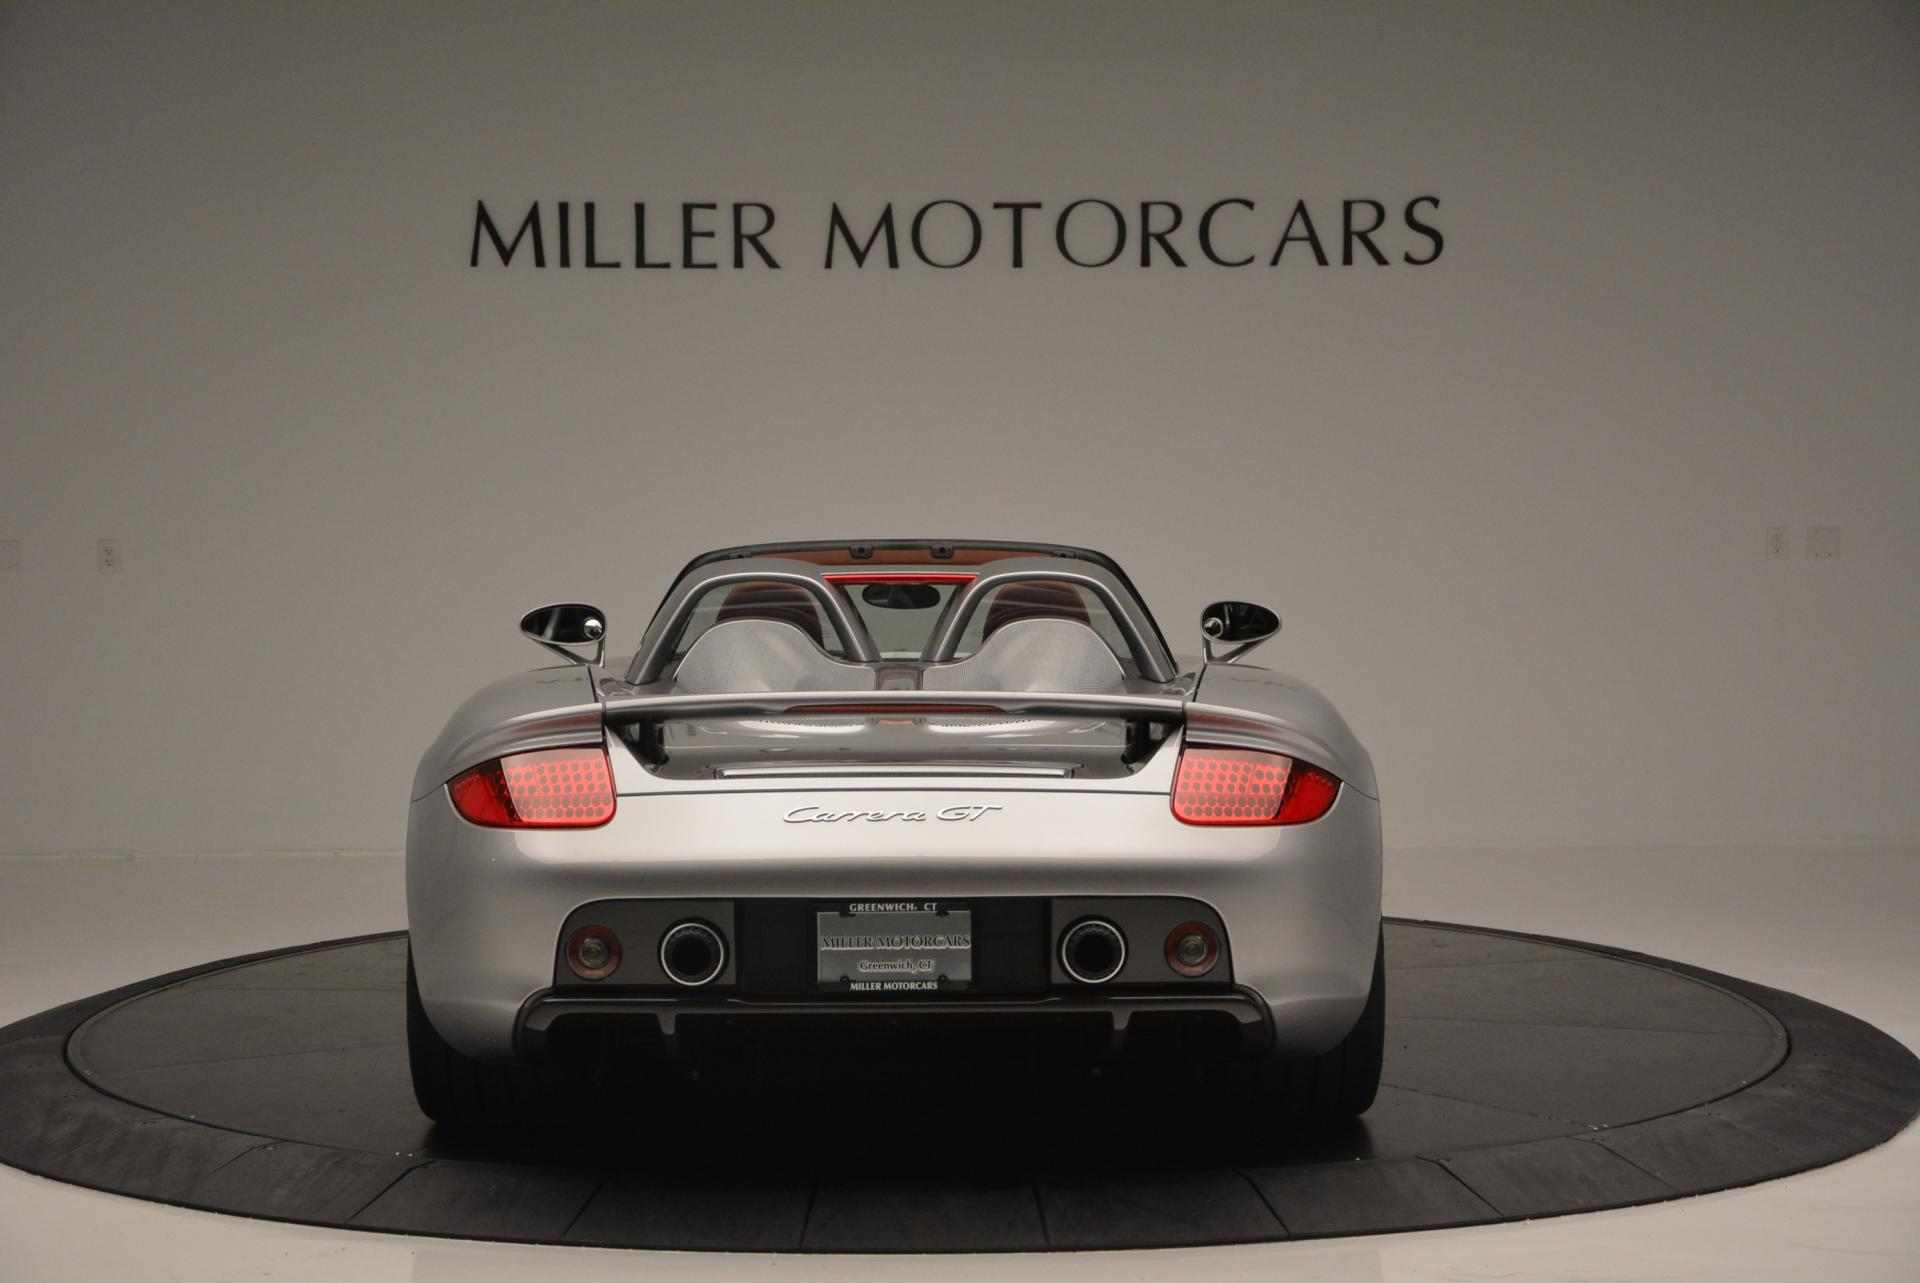 Used 2005 Porsche Carrera GT  For Sale In Greenwich, CT 108_p7